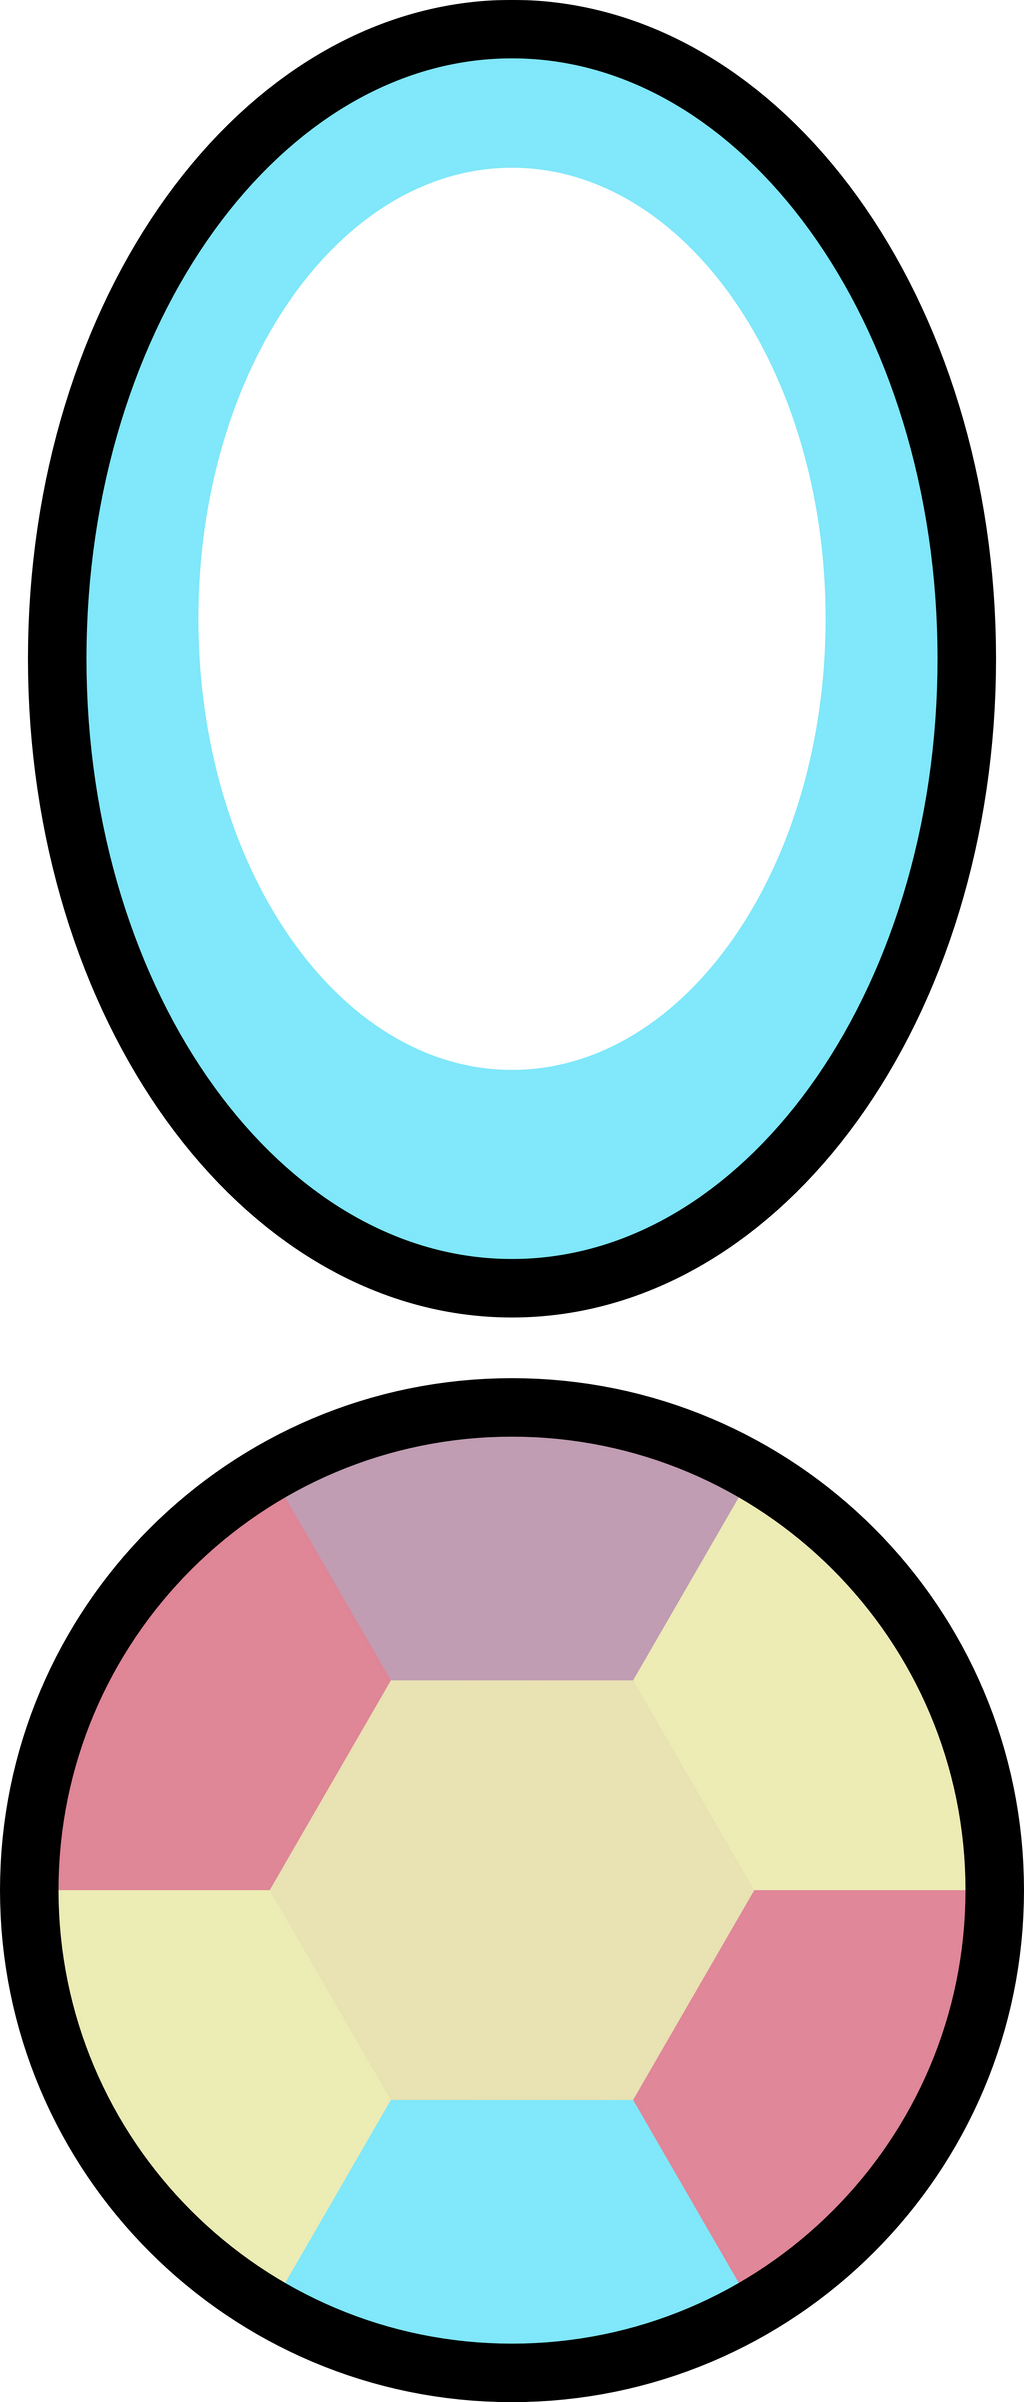 Steven Universe - Opal Vector by MrBarthalamul on DeviantArt